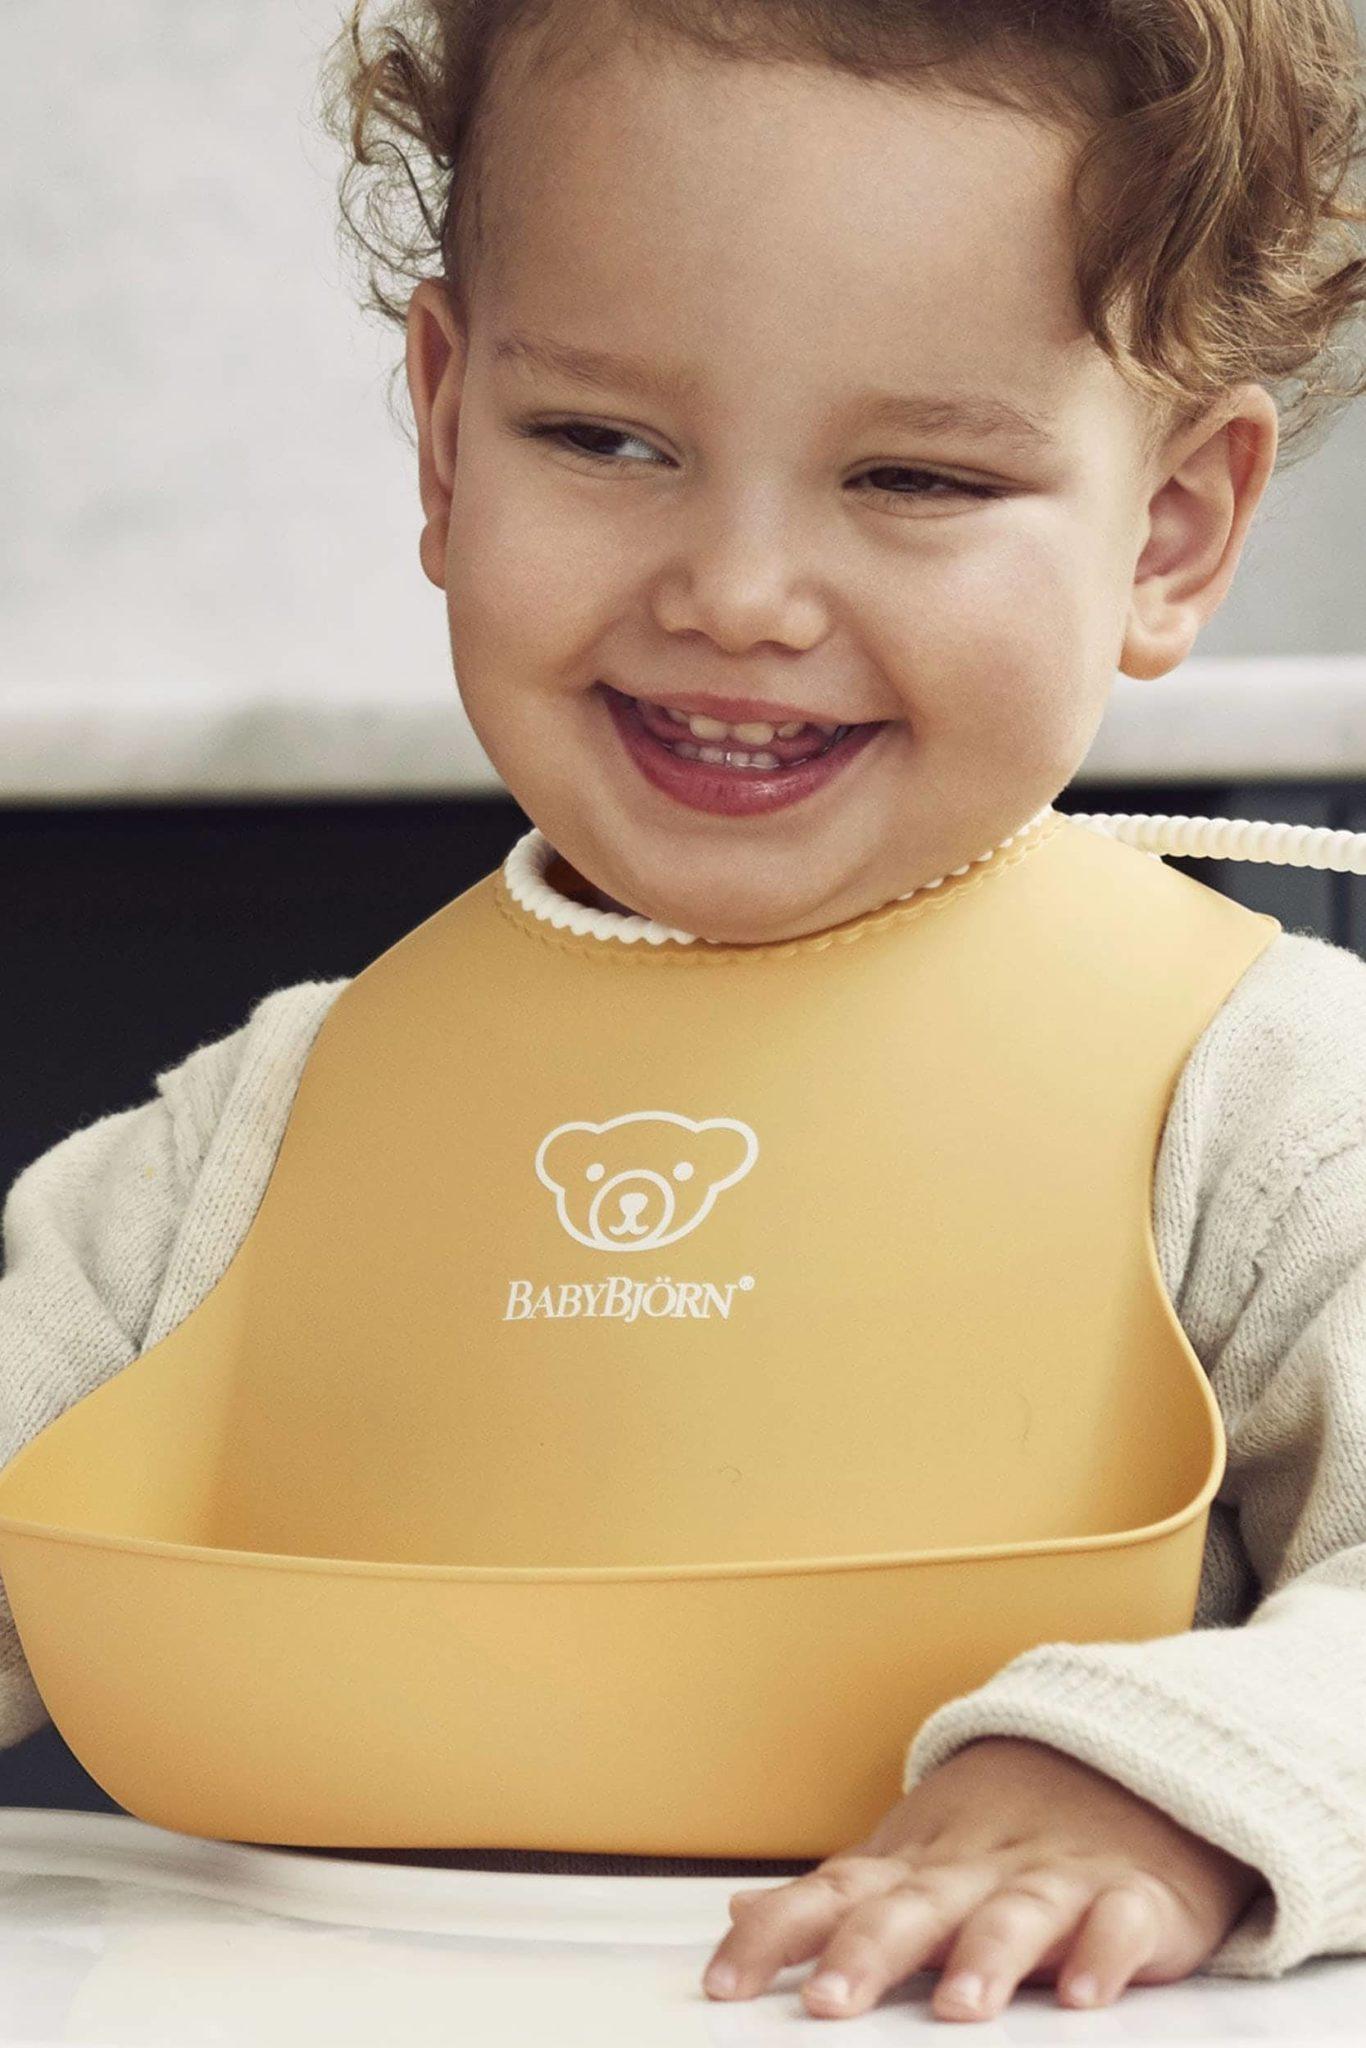 Babybjorn Feeding Bib Set Powder Yellow 004